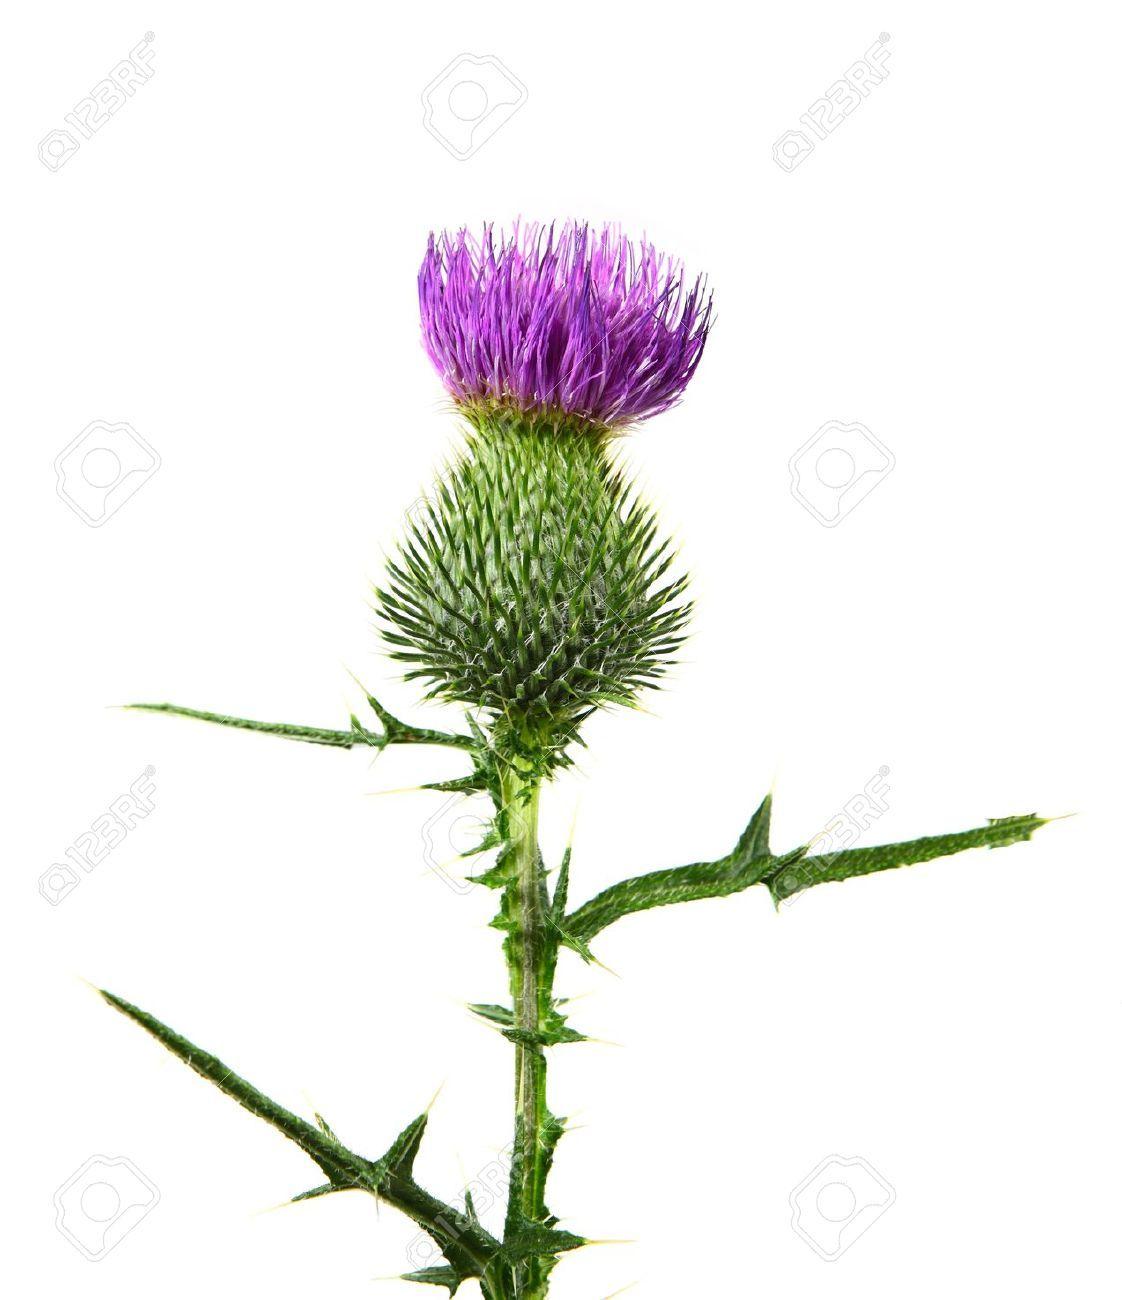 Kenneth McKellar - The Thistle Of Scotland - - YouTube